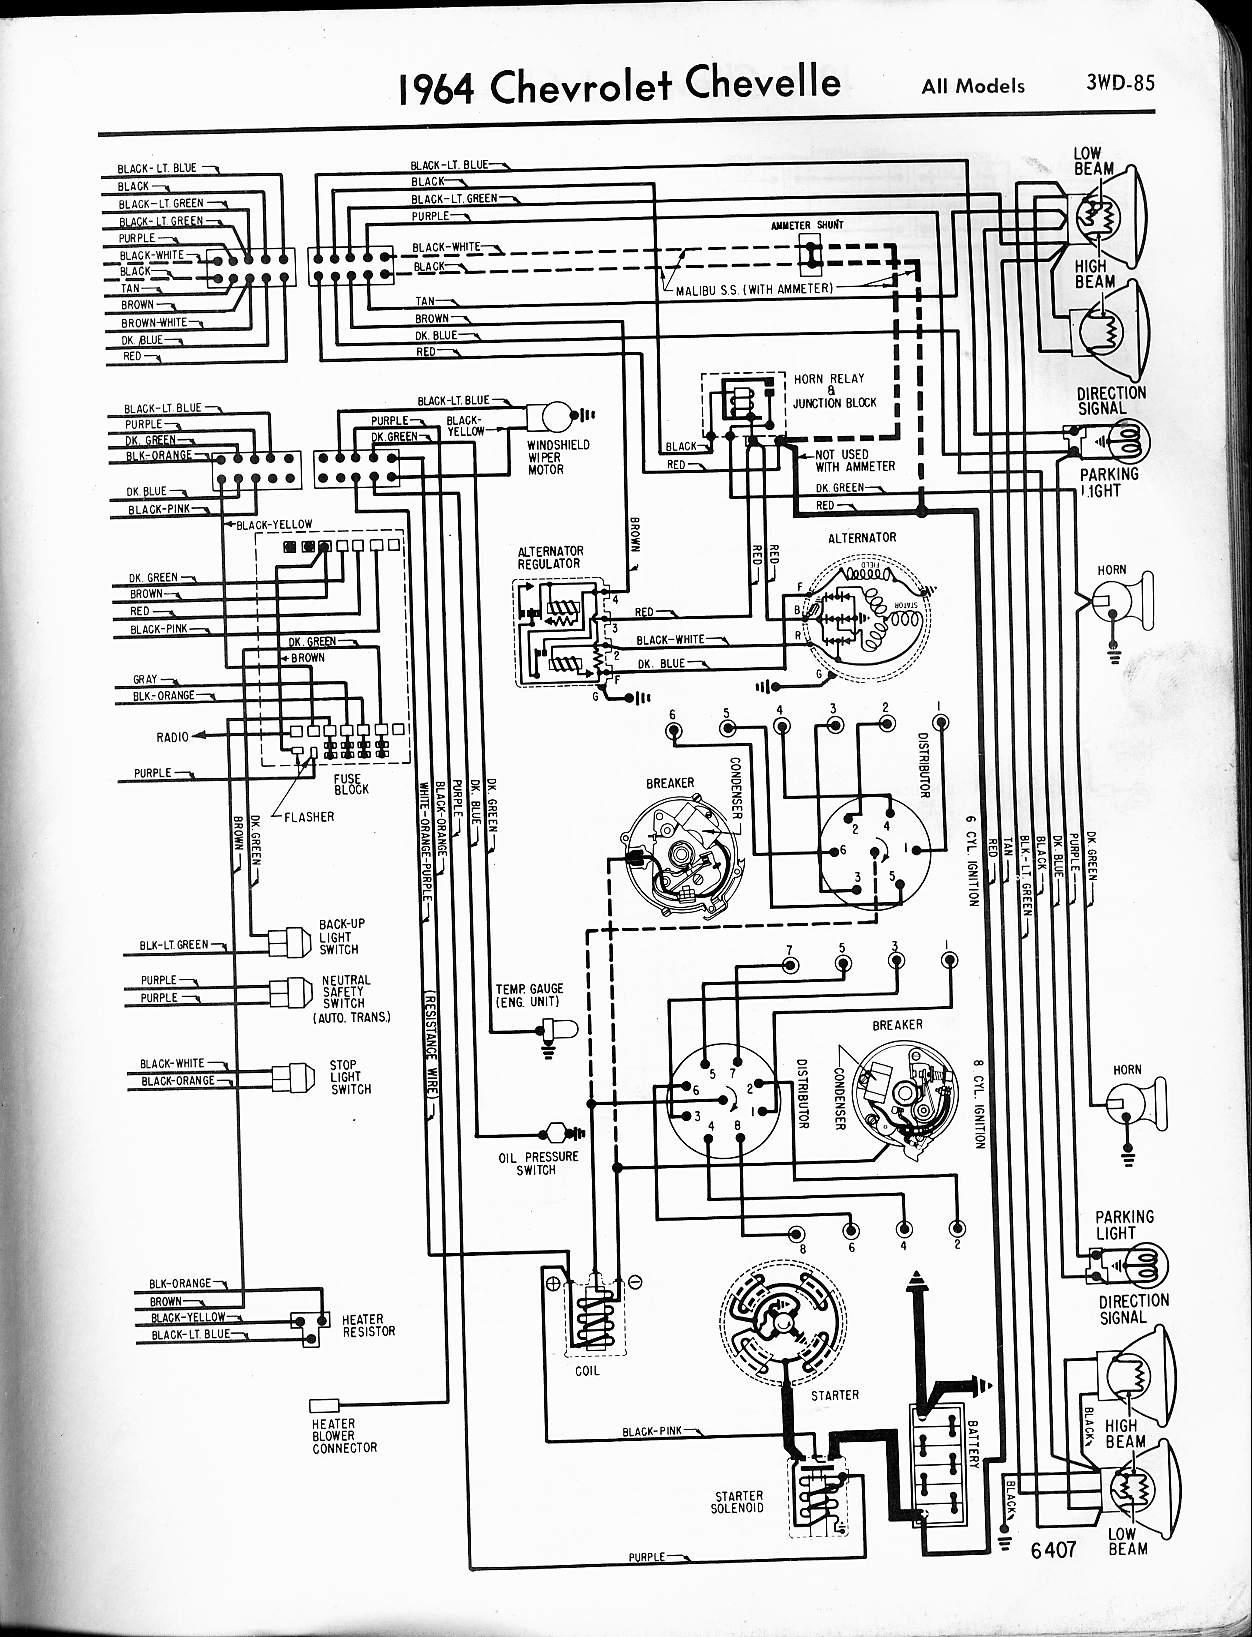 Fine 57 Chevy Wiring Basic Electronics Wiring Diagram Wiring Cloud Uslyletkolfr09Org